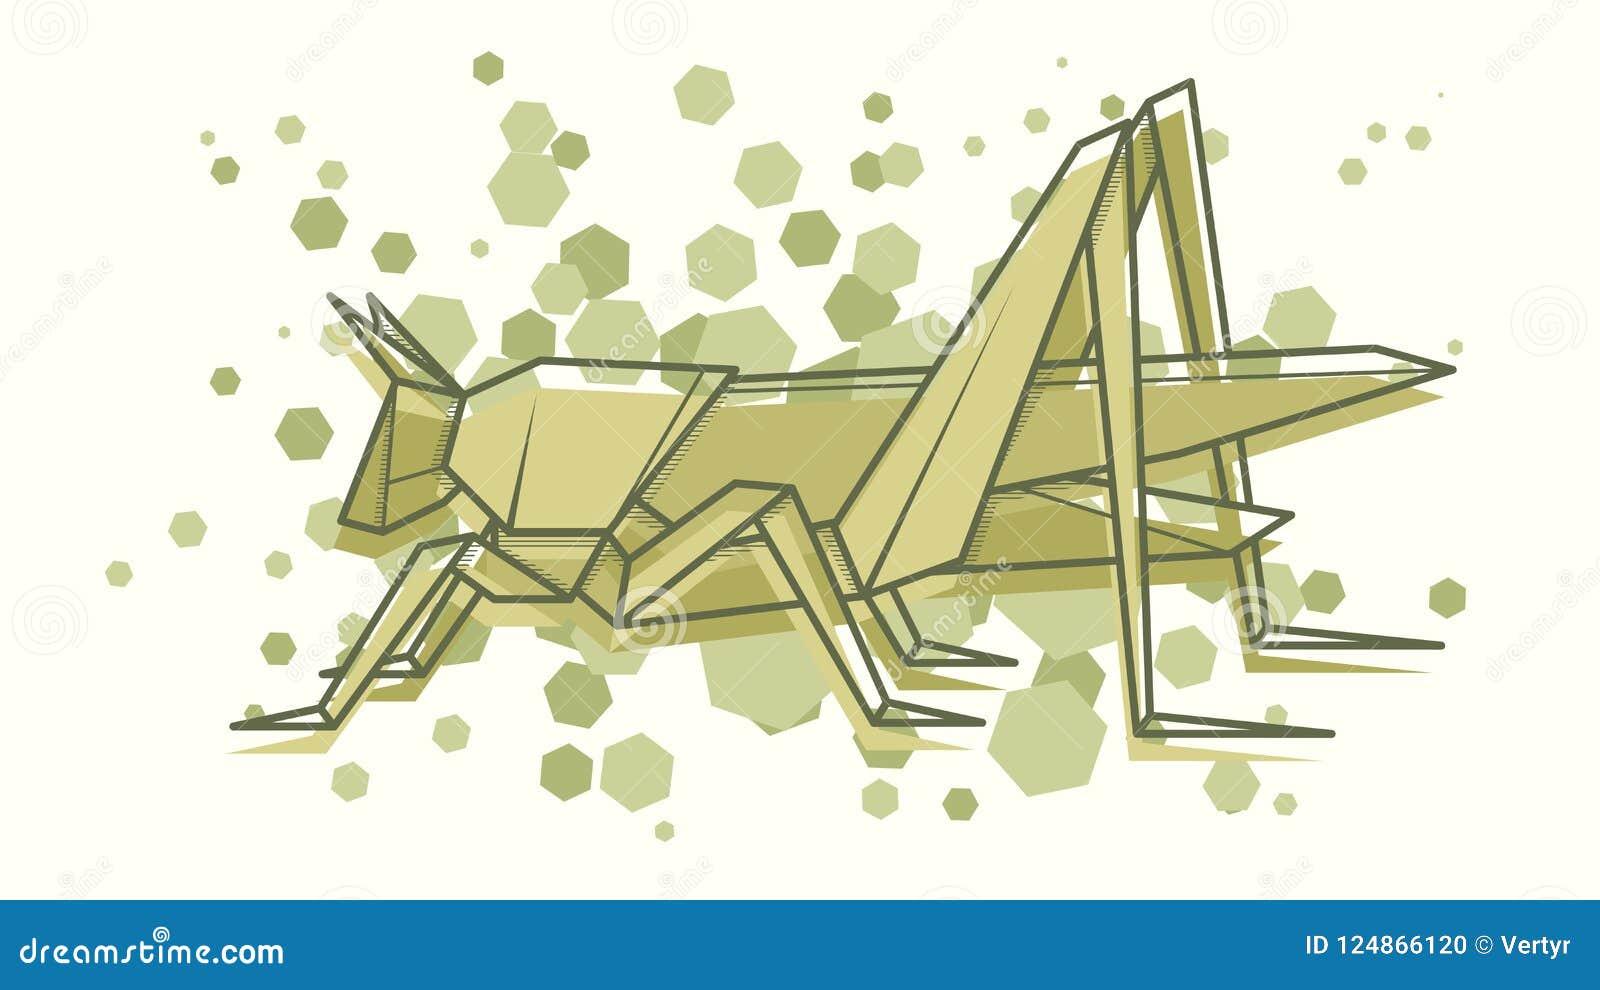 Origami Grasshopper Stock Illustrations – 29 Origami Grasshopper ... | 821x1300